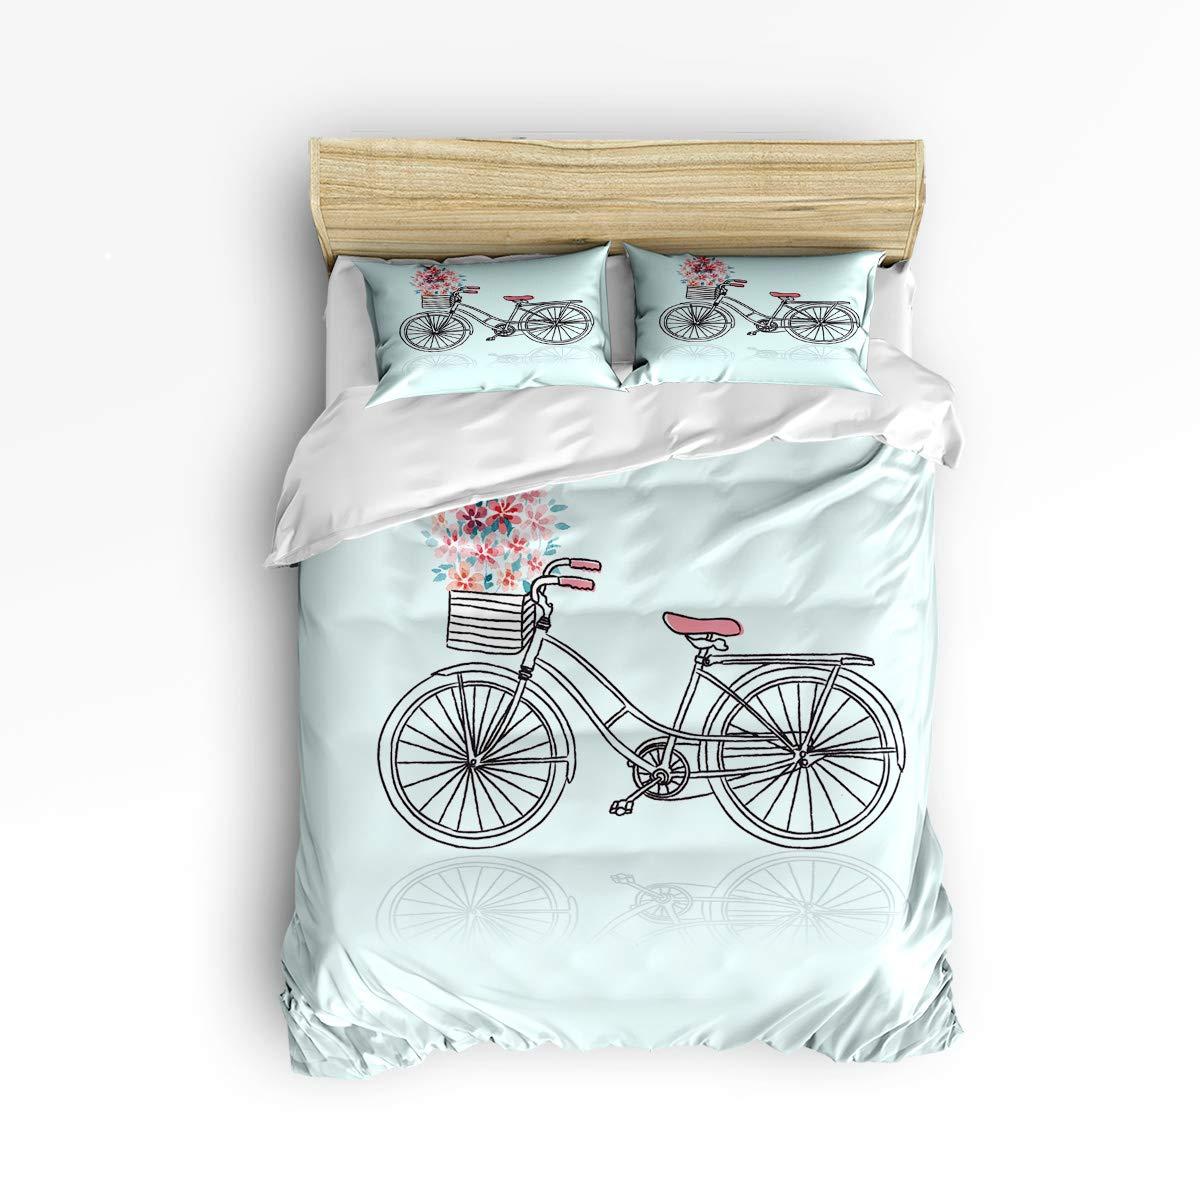 EZON-CH かわいい布団カバー3点セット 子供用 ベッドセット 男の子 女の子 美しい花と鹿のヘラジカ柄 ホームインテリア寝具セット 枕カバー2枚付き King Size 20181218WHLEZONSJSSSSTW02363SJSDEZN B07LGBRLCM Bicycle Romanticezn7338 King Size